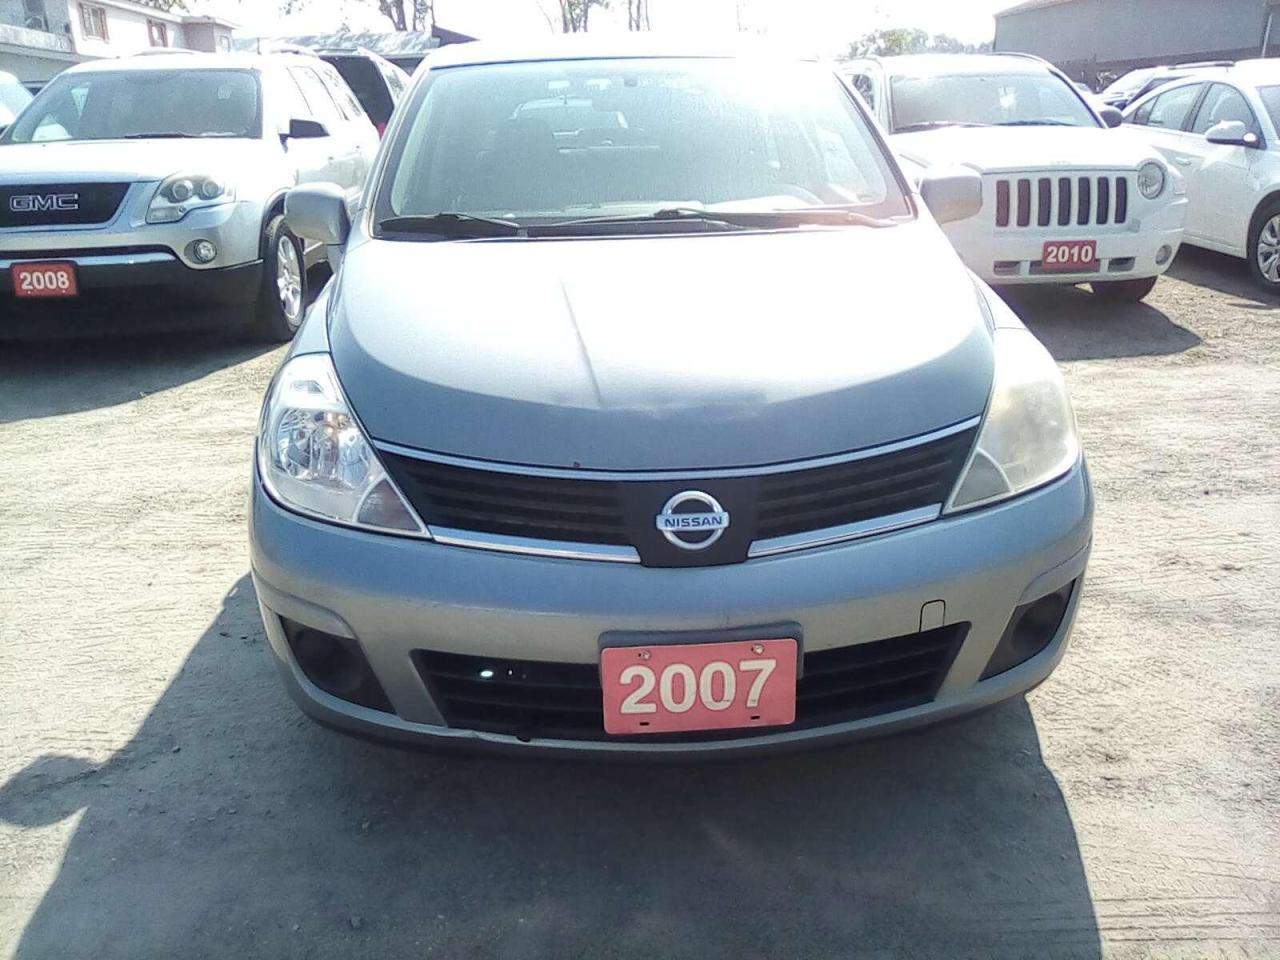 2007 Nissan Versa 1.8 S Sedan